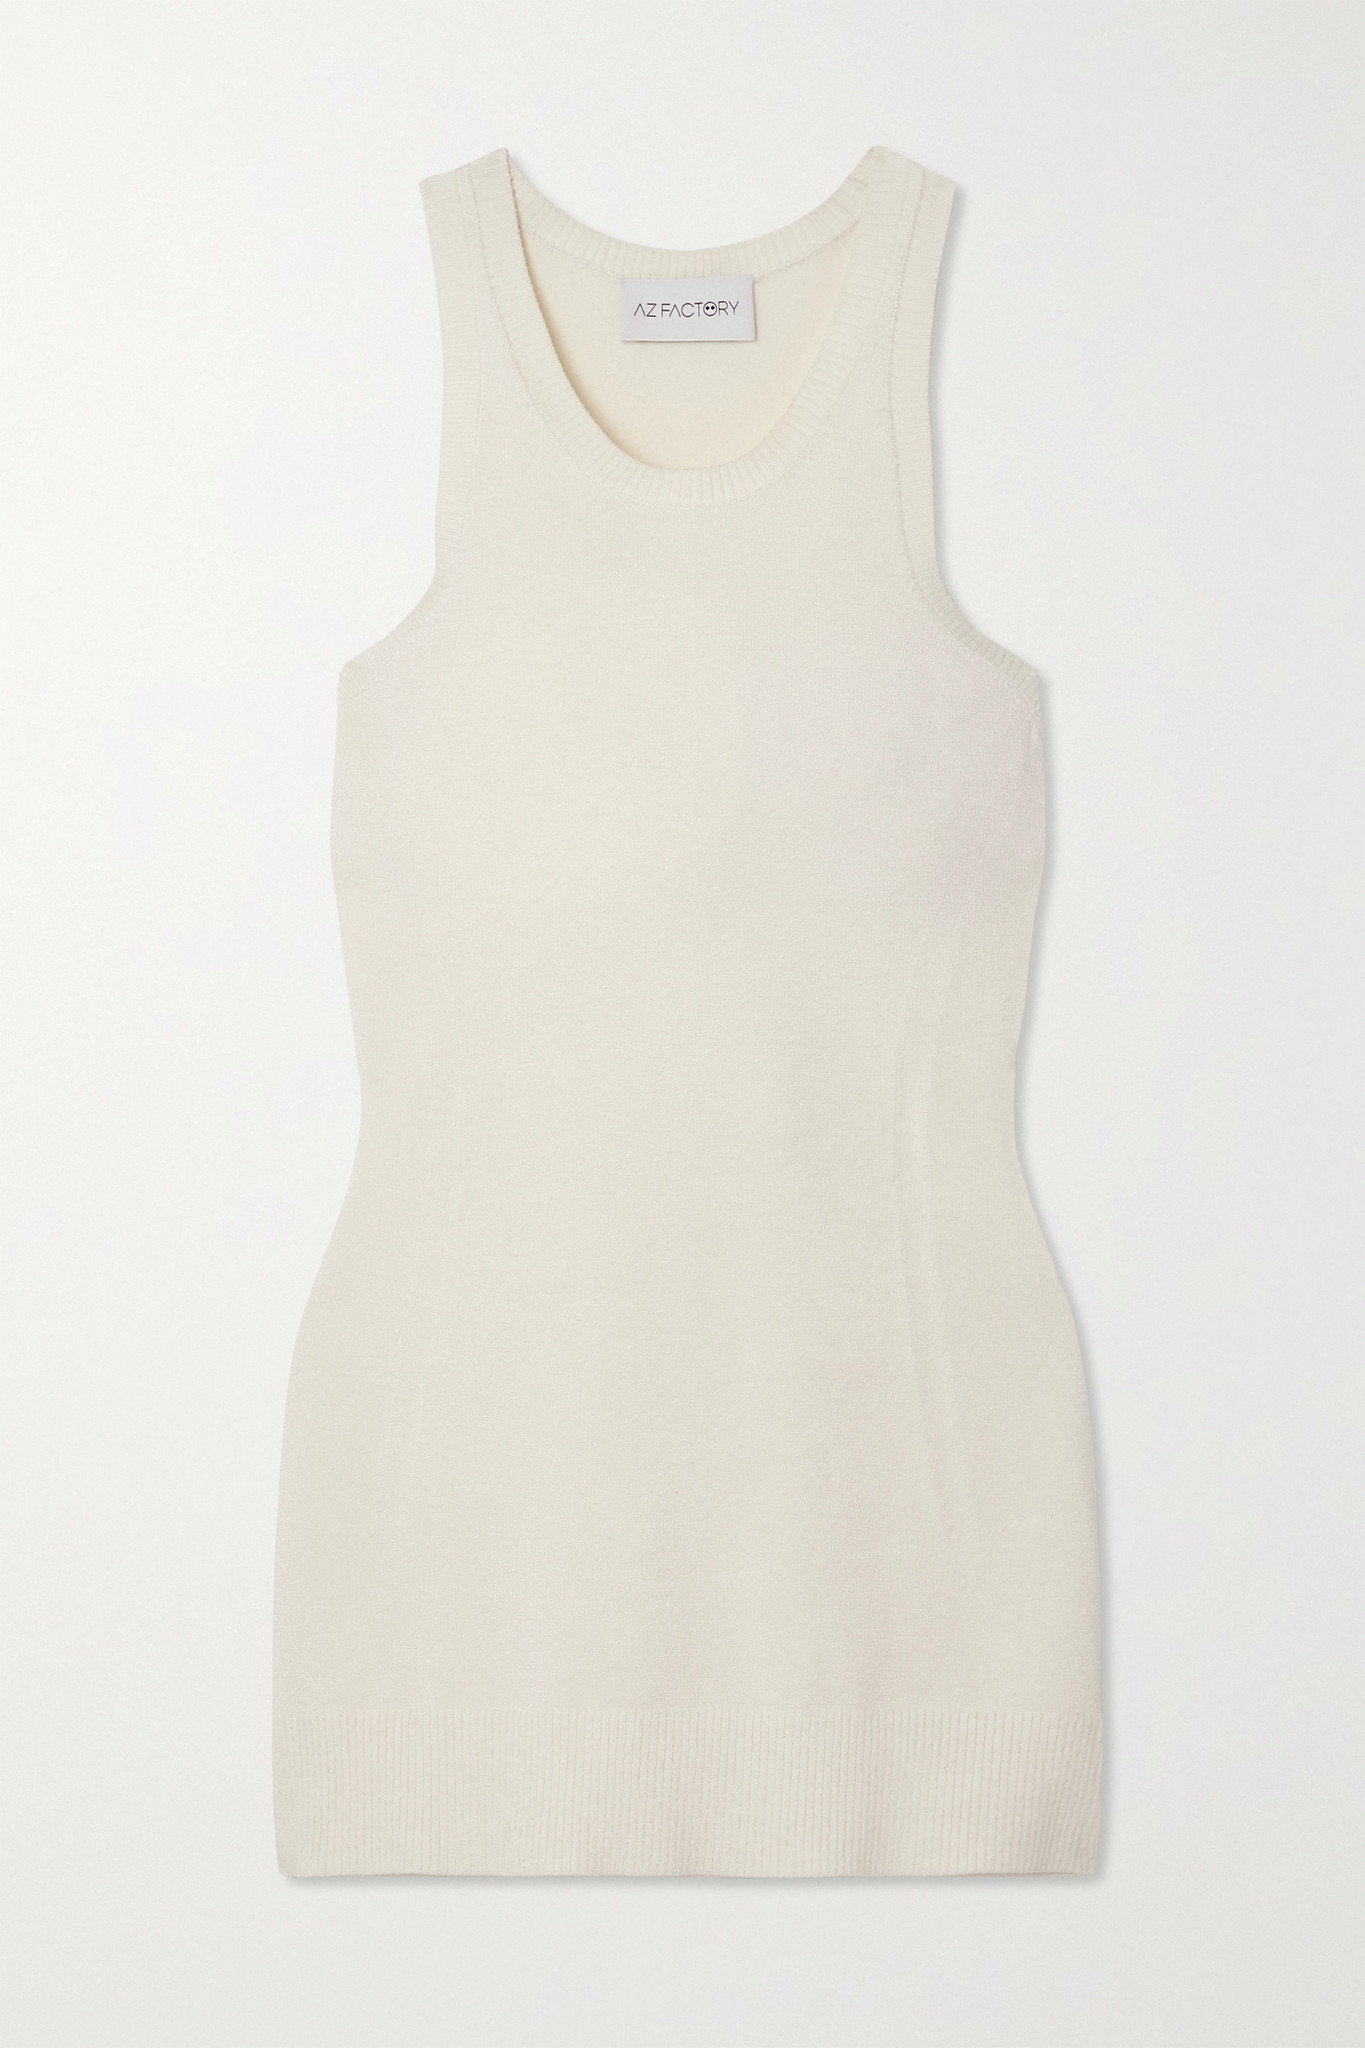 AZ FACTORY - Mybody Stretch-knit Tank - White - XXS